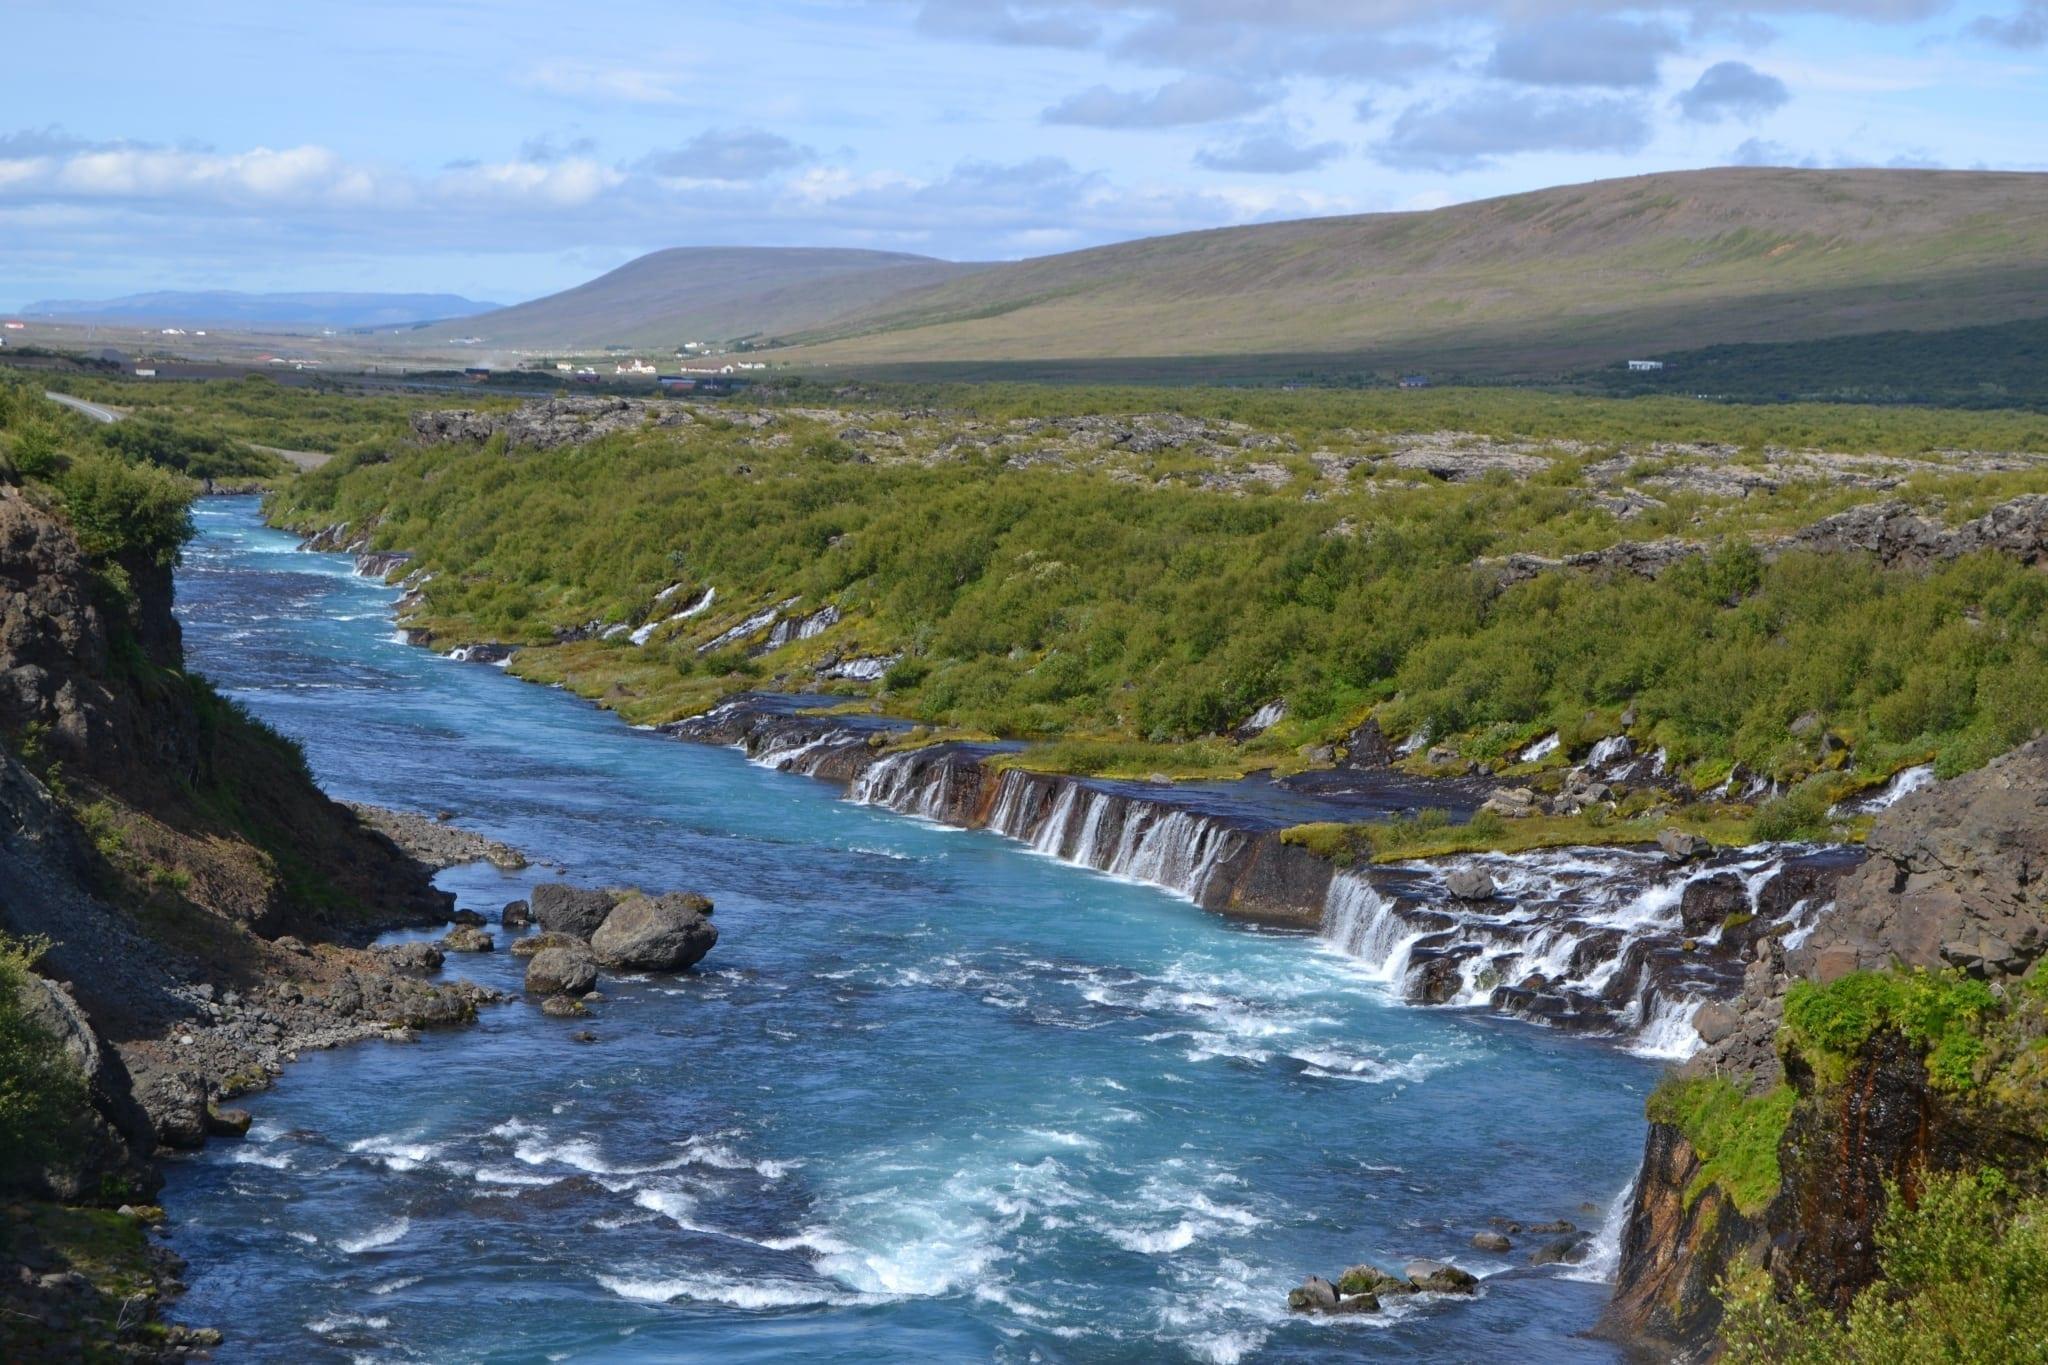 Die Lavawasserfälle Hraunfossar. Foto: Hörður Erlingsson